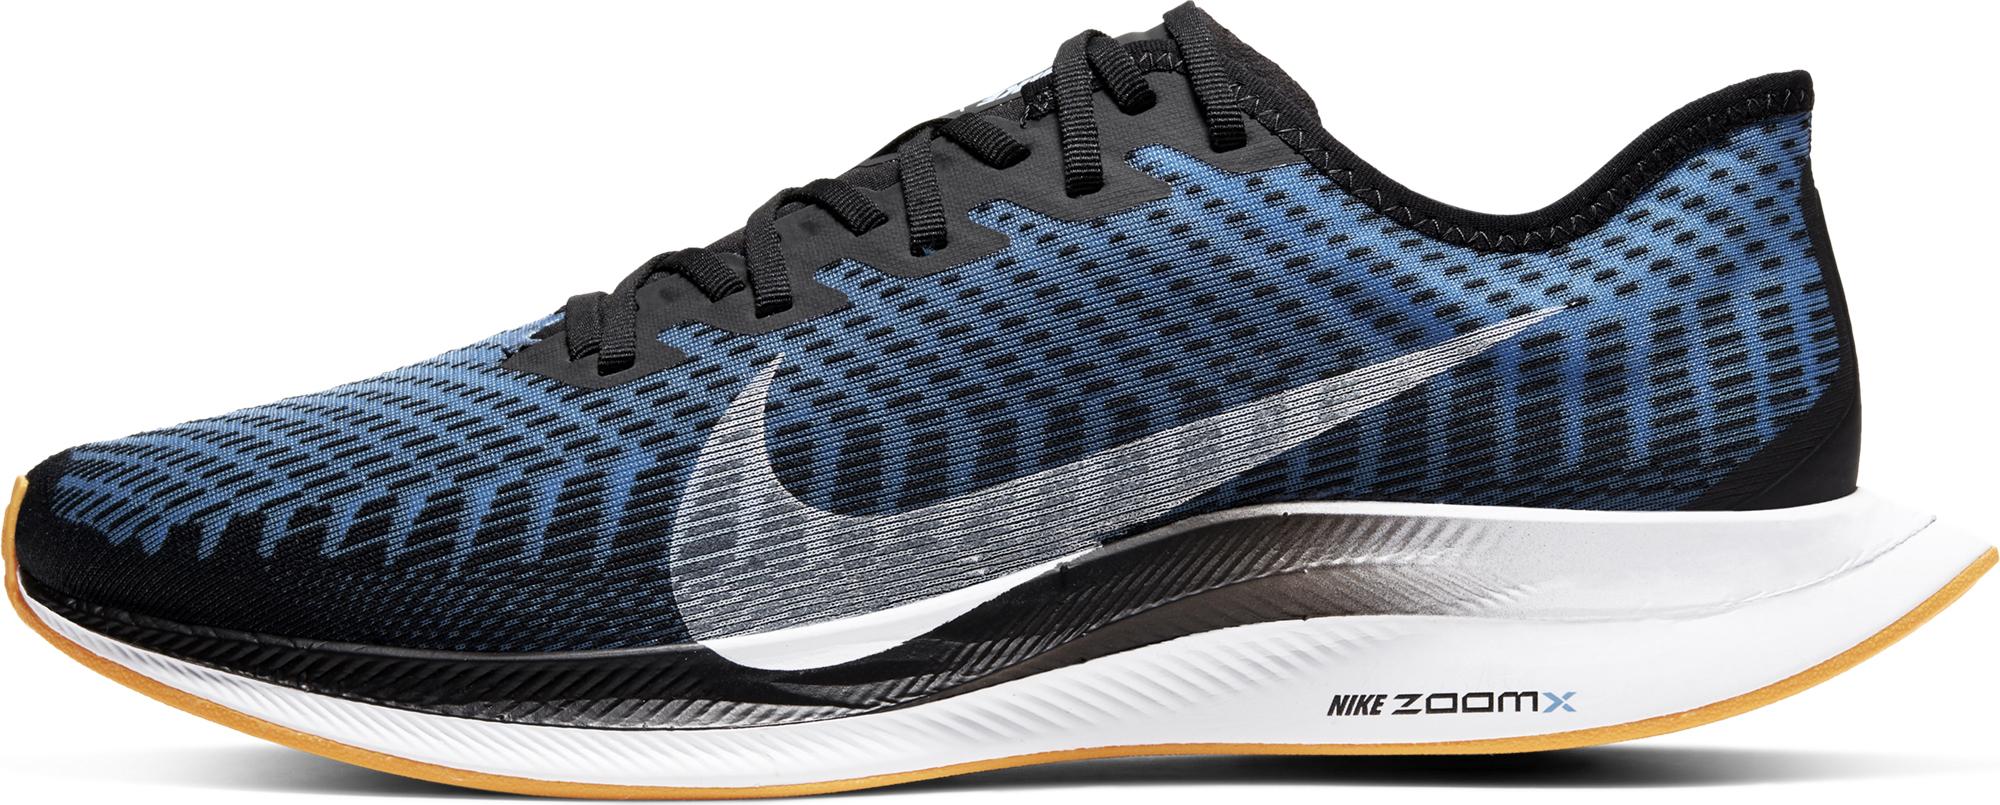 Nike Кроссовки мужские Zoom Pegasus Turbo 2, размер 41